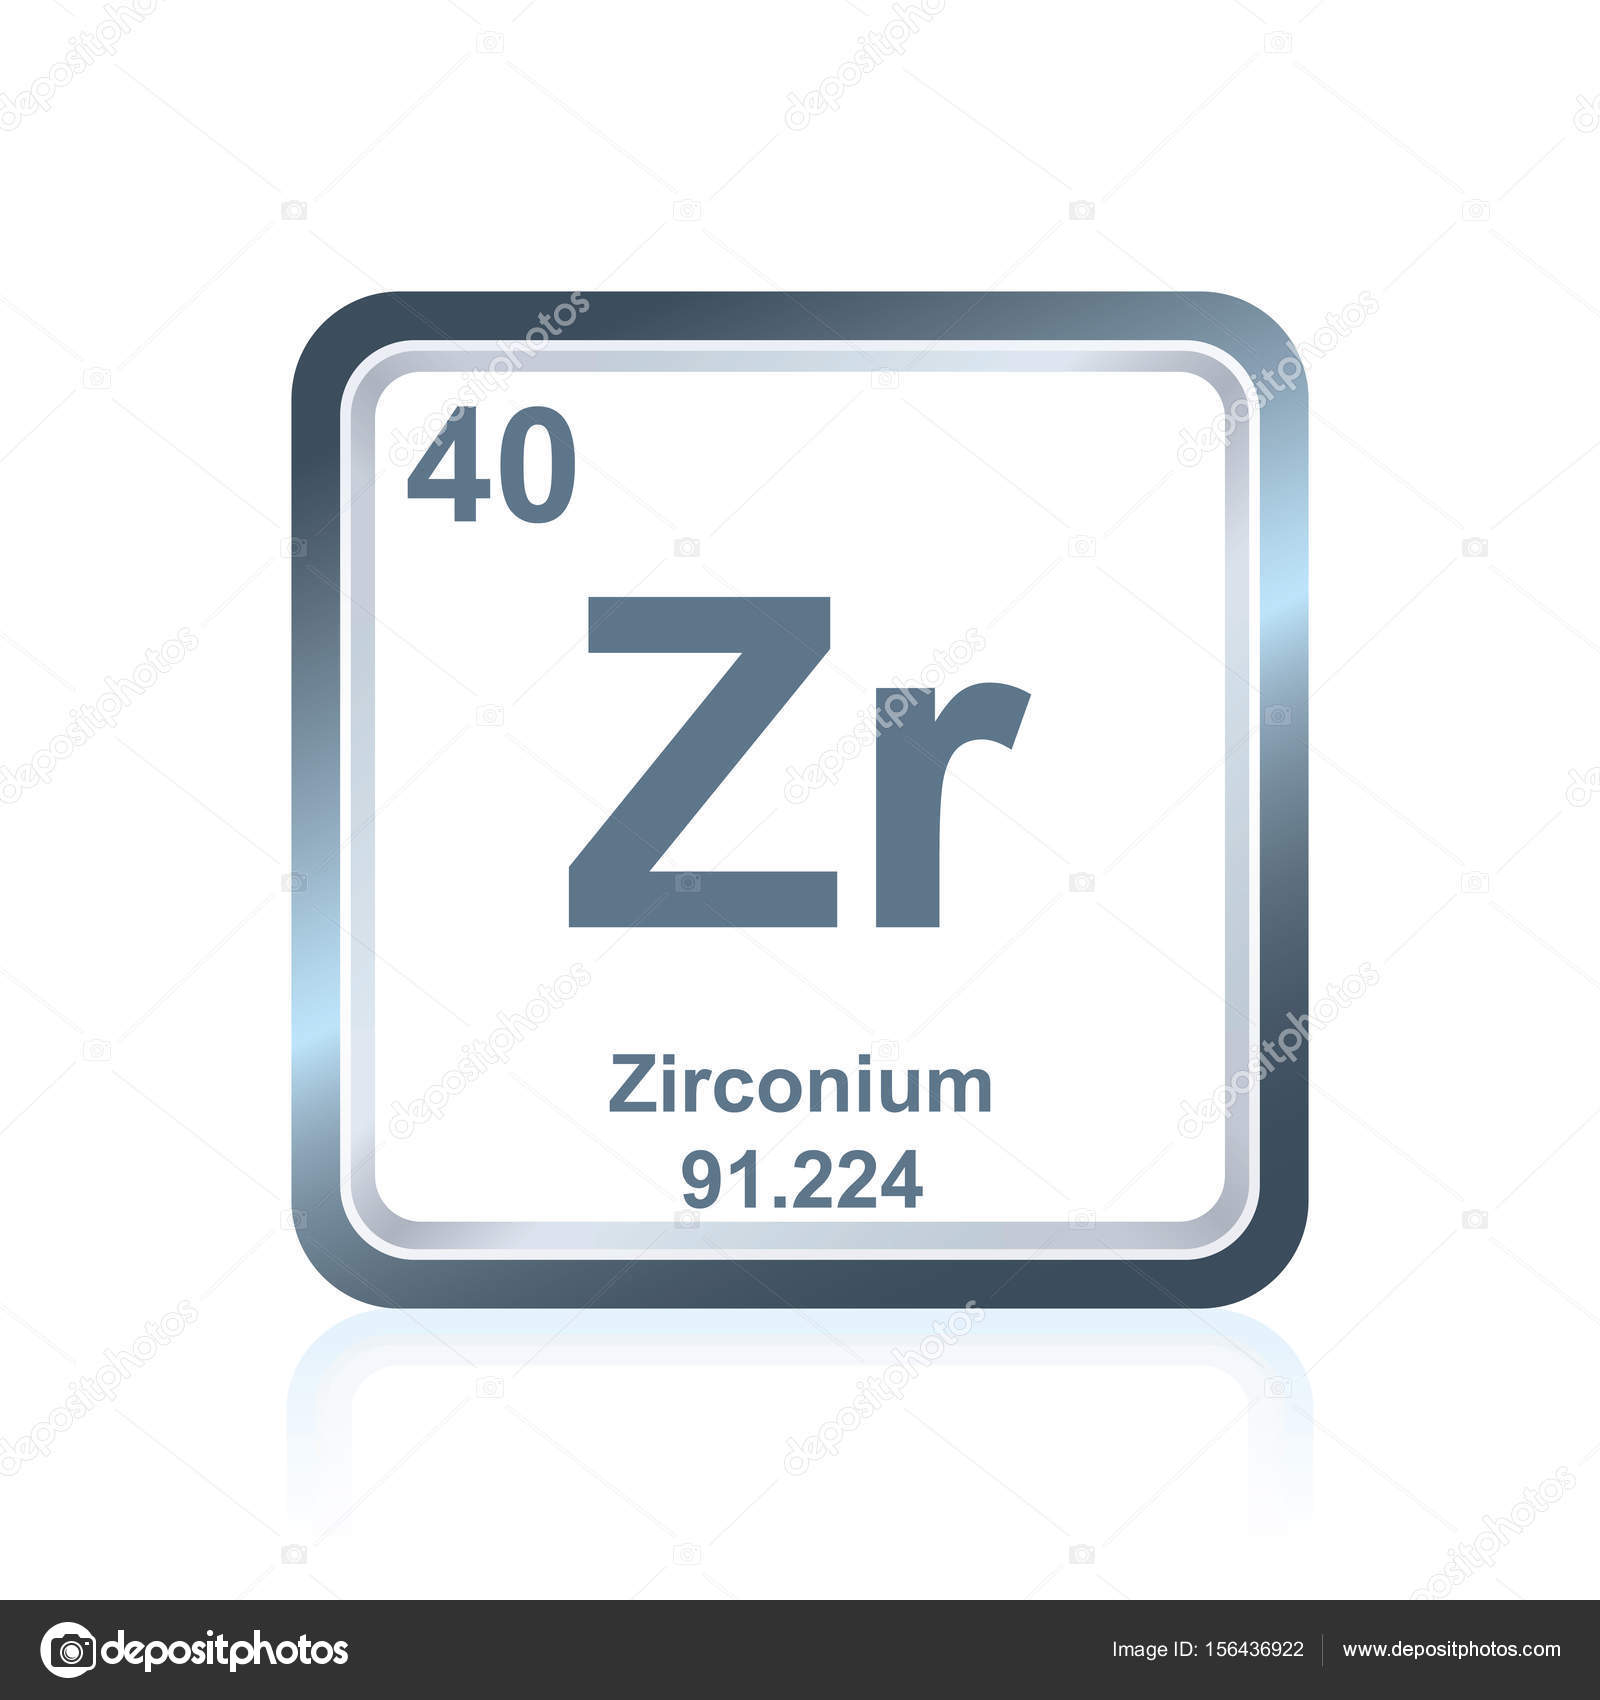 Chemical element zirconium from the periodic table stock vector chemical element zirconium from the periodic table stock vector urtaz Gallery